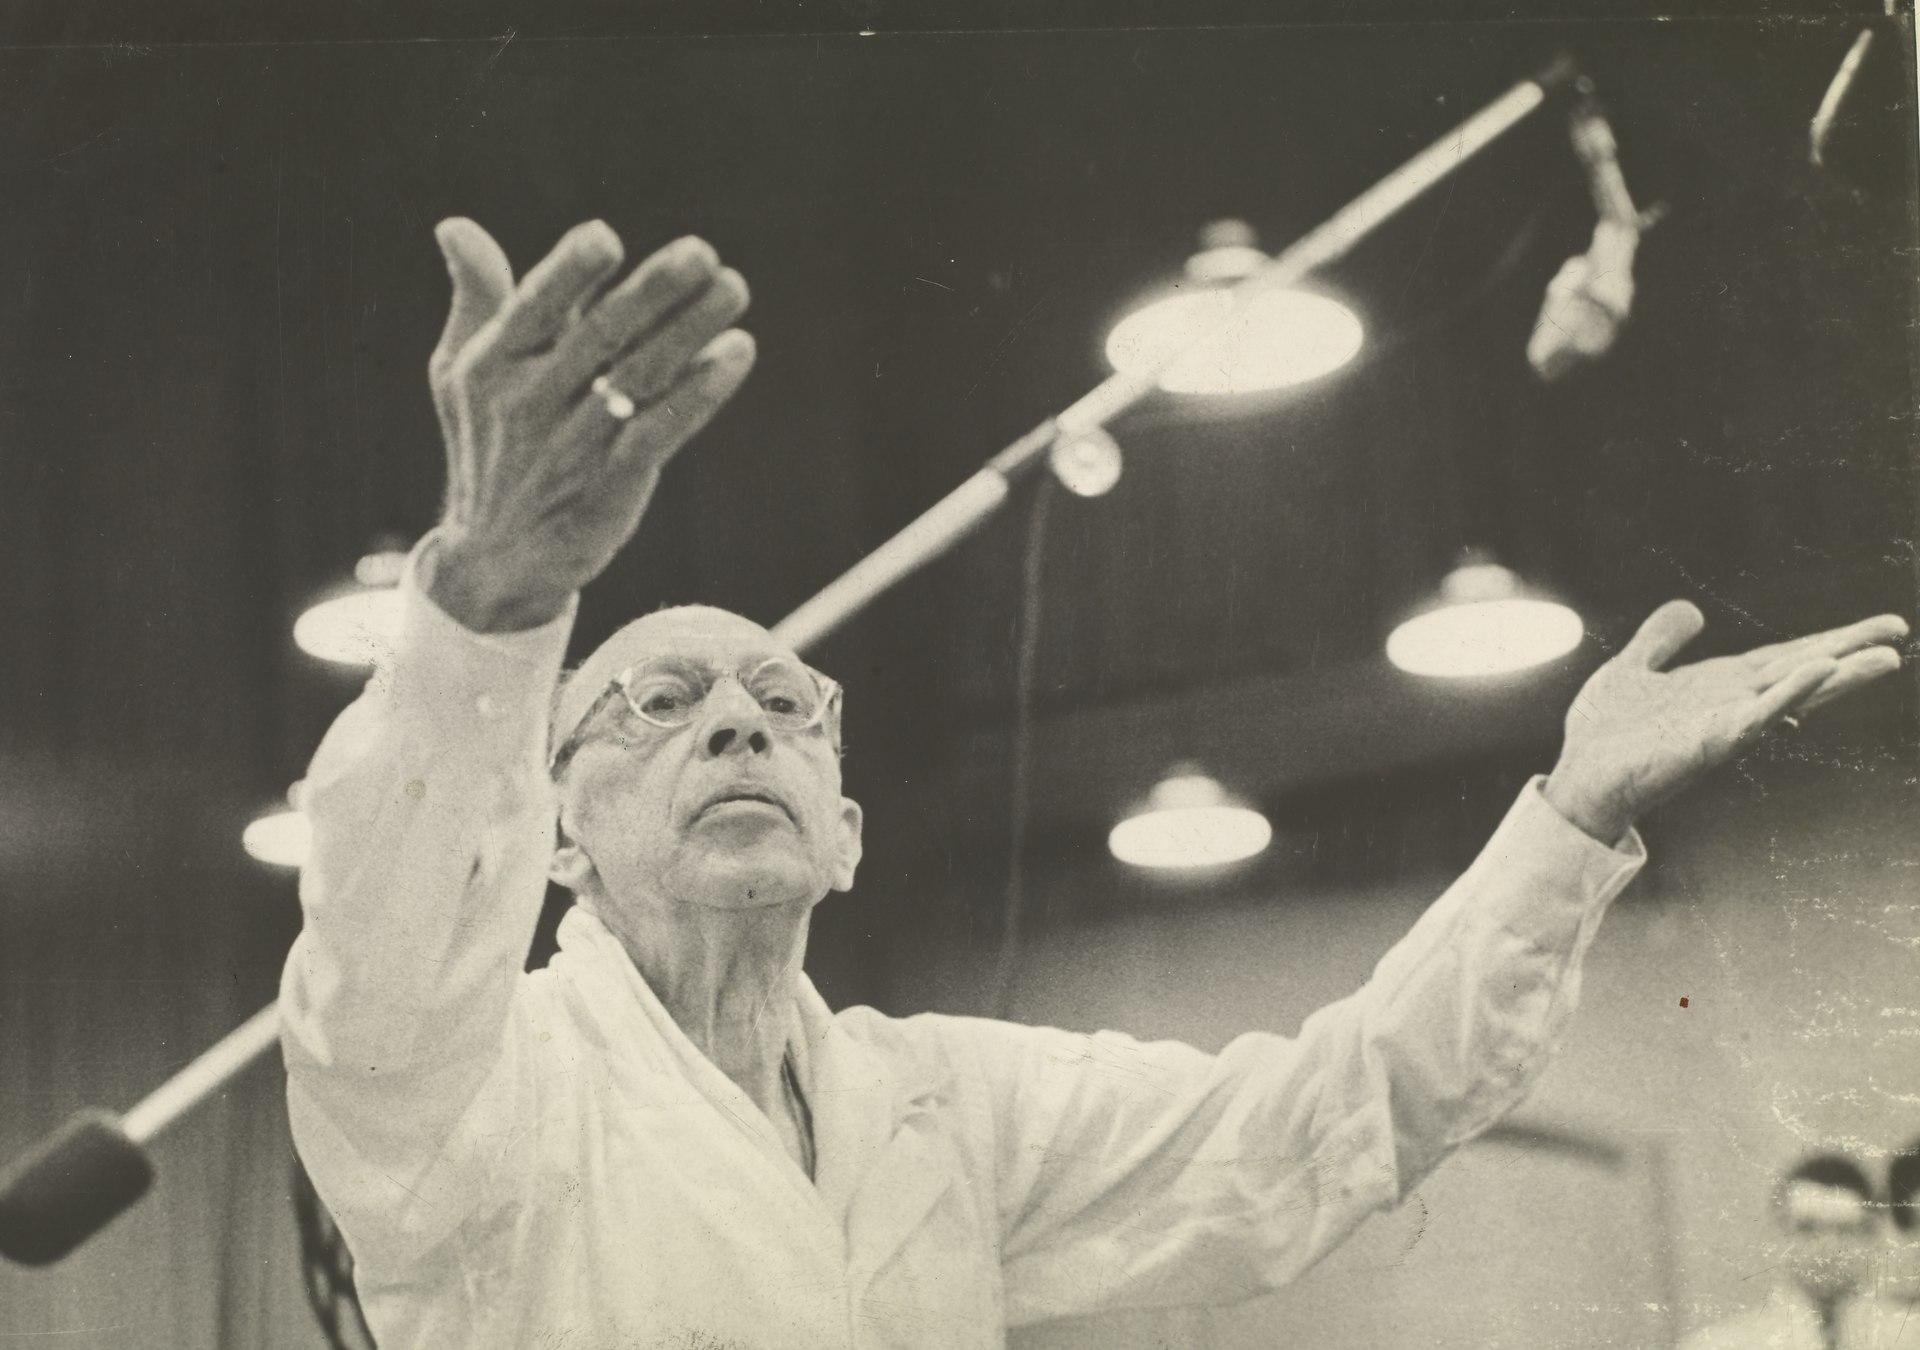 Igor Stravinsky, 1962